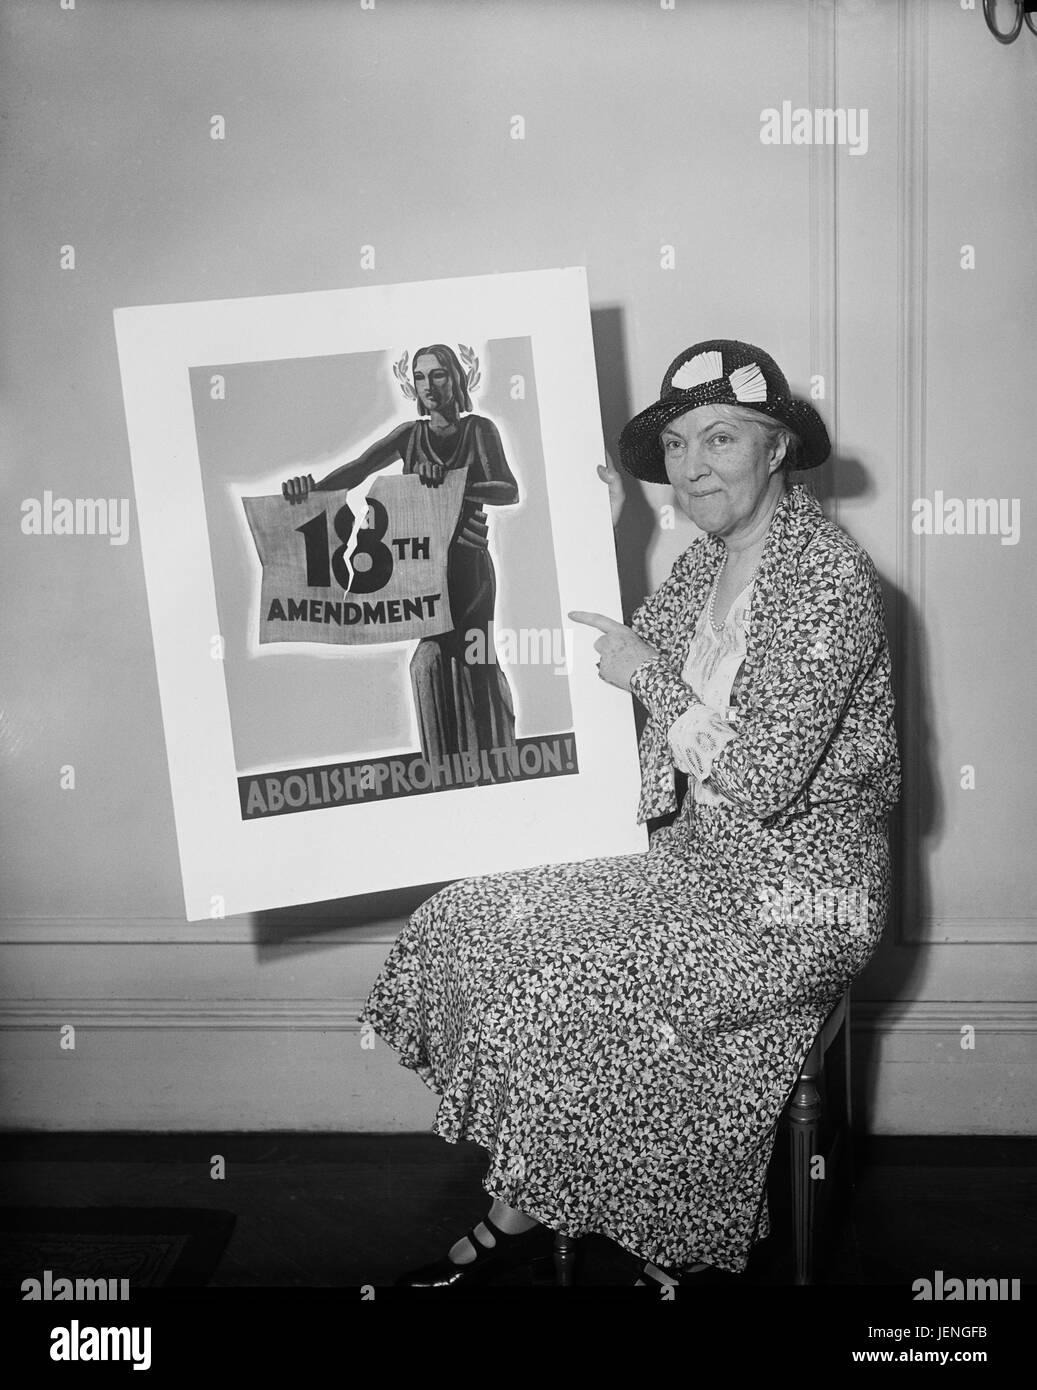 Woman Holding Poster, 'Abolish Prohibition!', USA, Harris & Ewing, 1931 - Stock Image